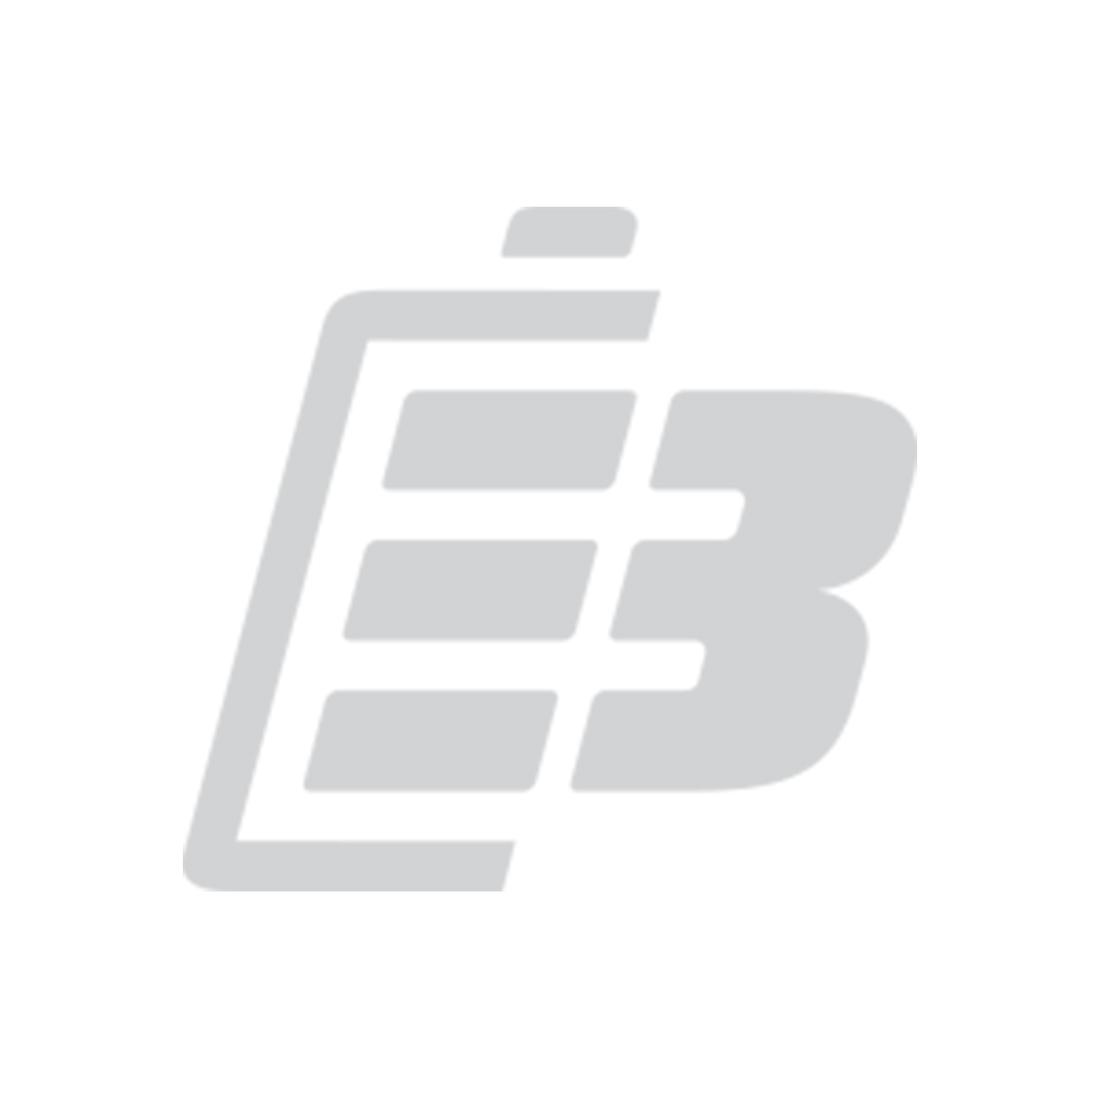 Panasonic Ncr18650a Battery 18650 3100mah